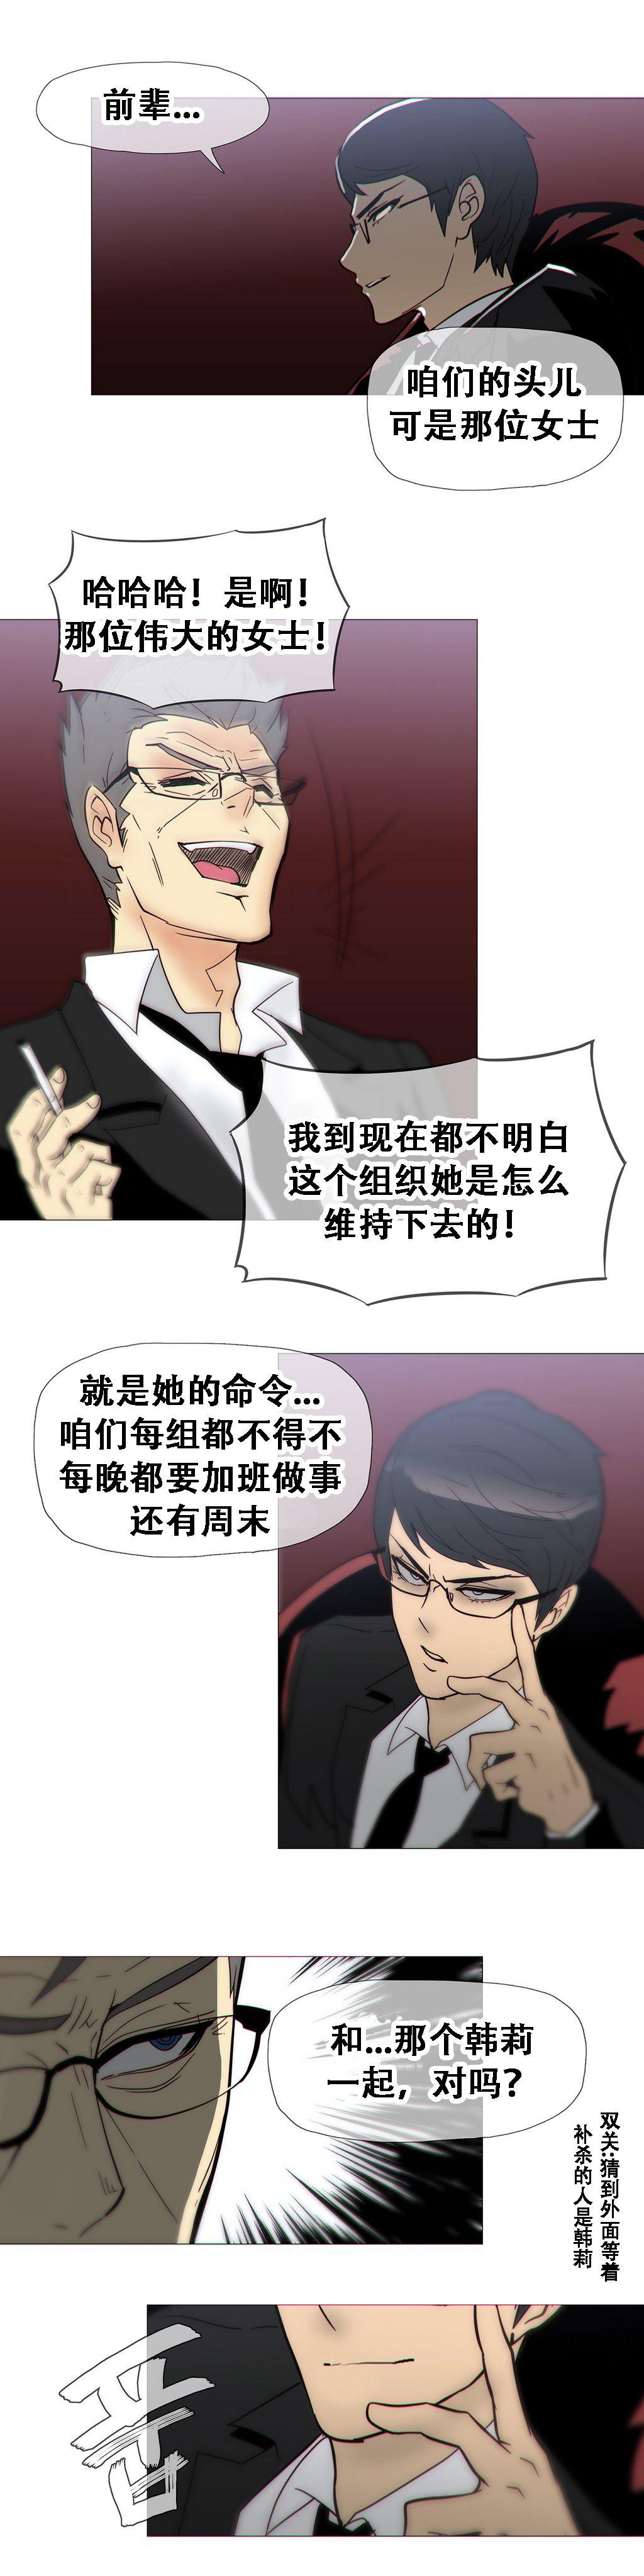 HouseHold Affairs 【卞赤鲤个人汉化】1~33话(持续更新中) 338